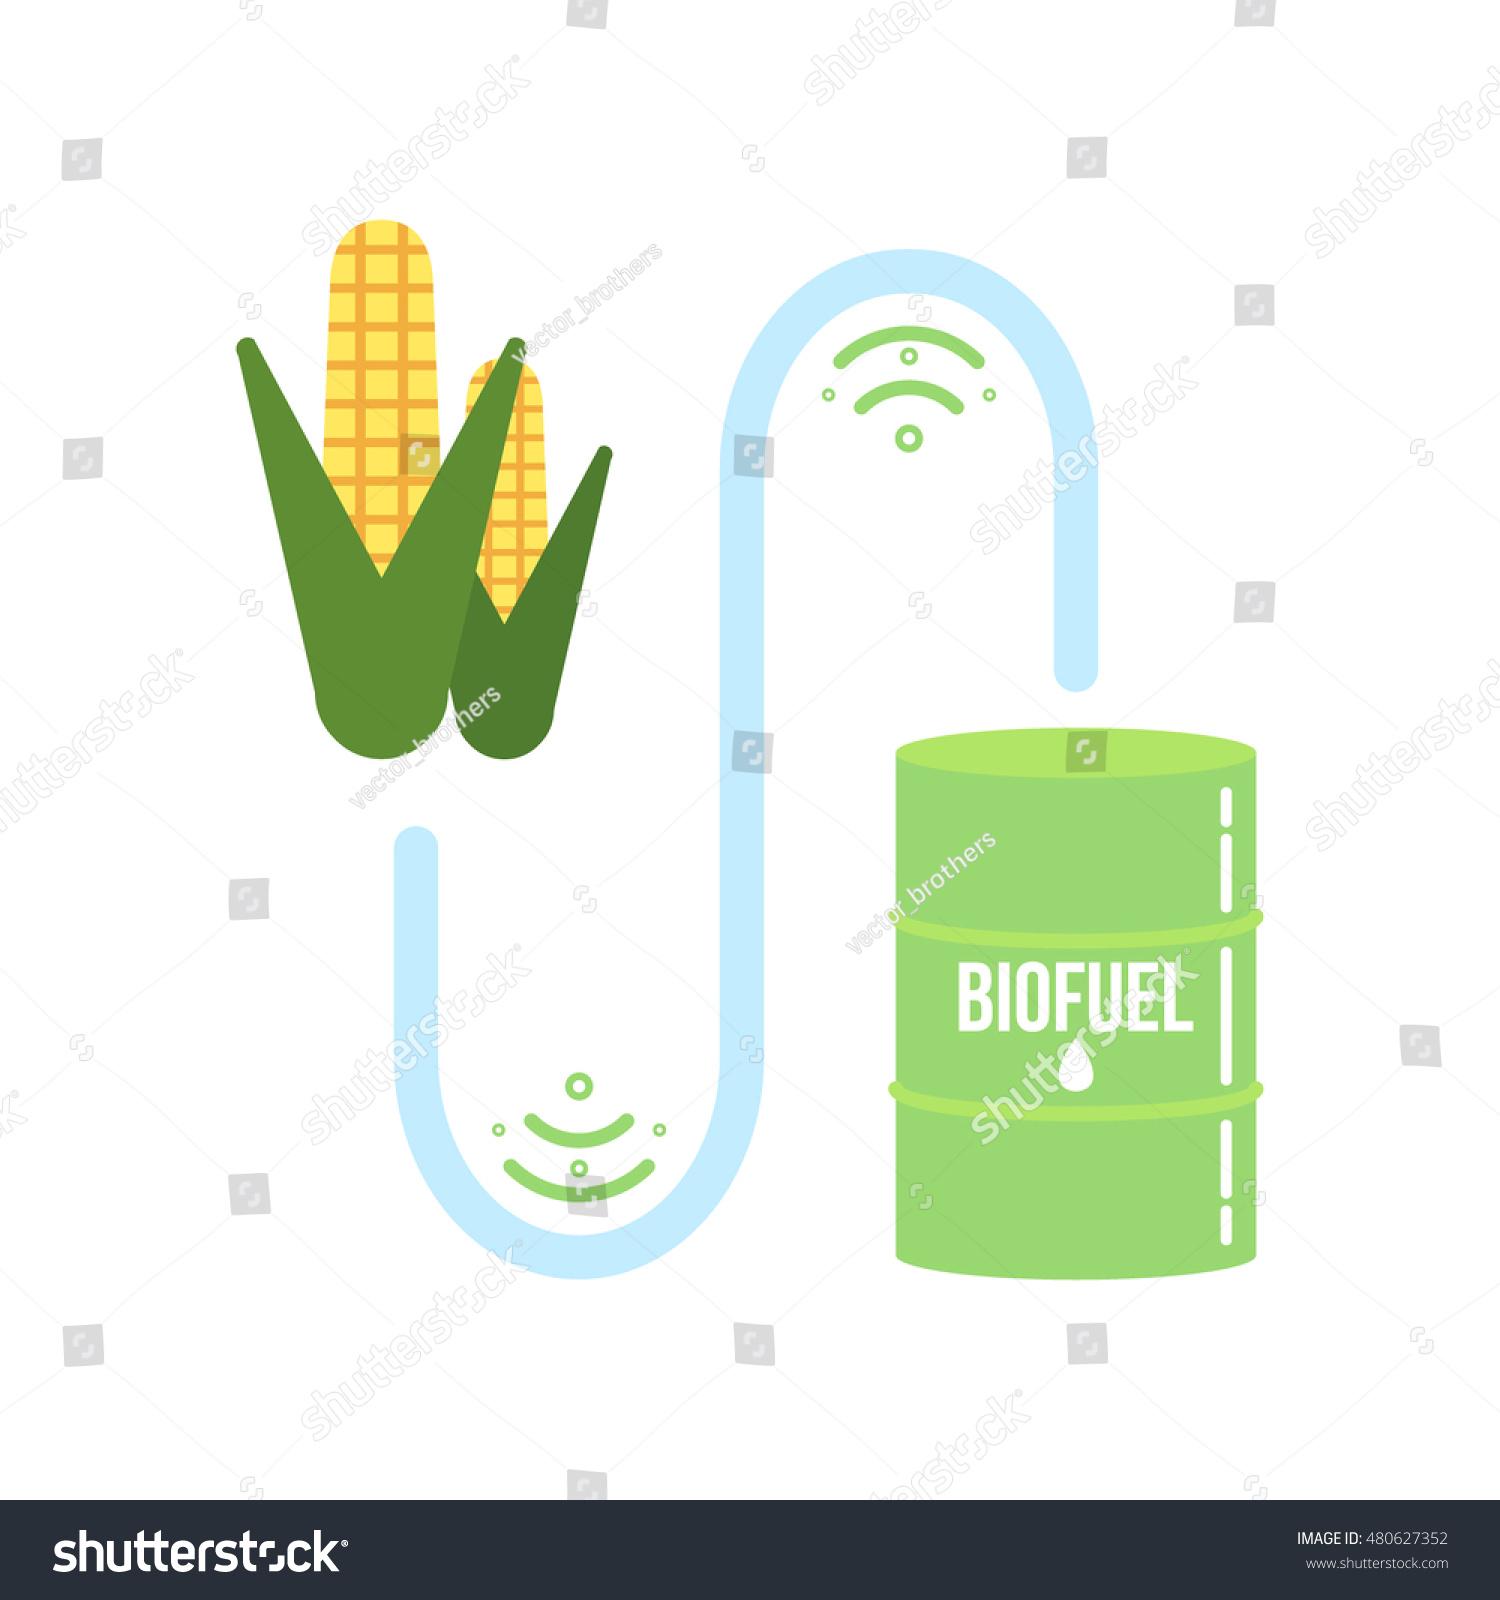 Corn ethanol biofuel vector icon alternative stock vector corn ethanol biofuel vector icon alternative environmental friendly fuel buycottarizona